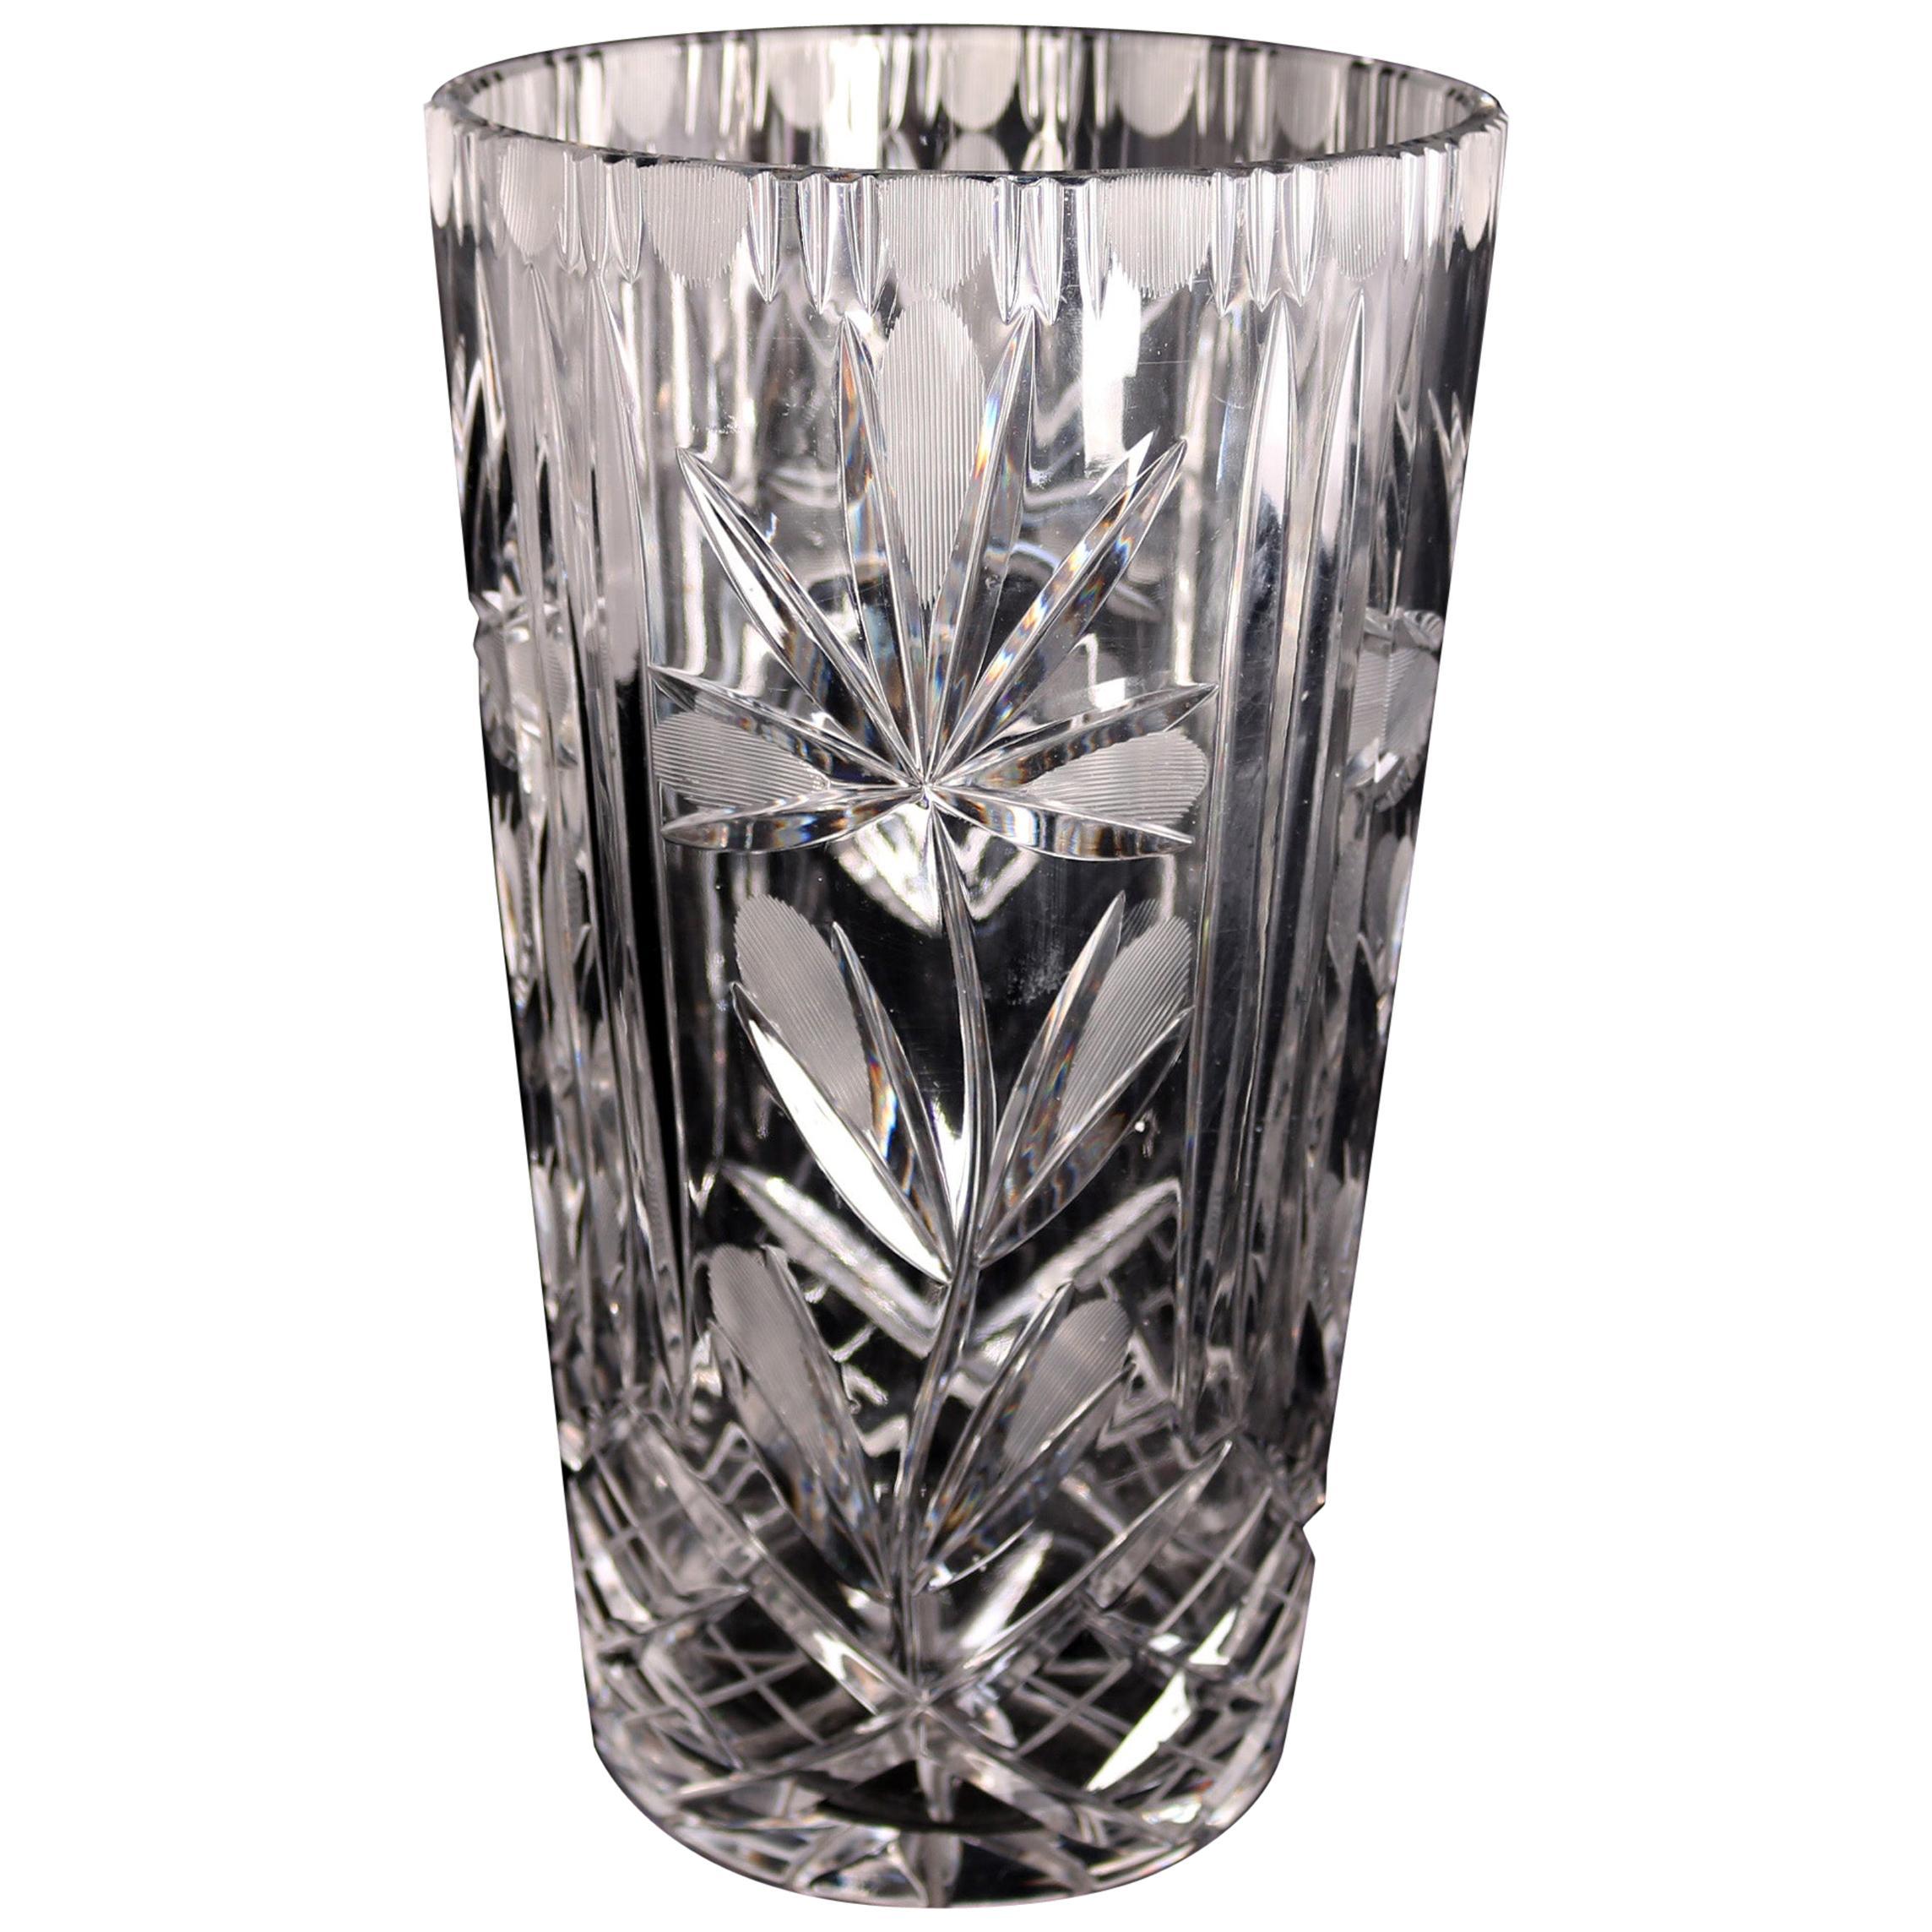 Vintage French Cut Crystal Lalique School Floral Vase, 20th Century